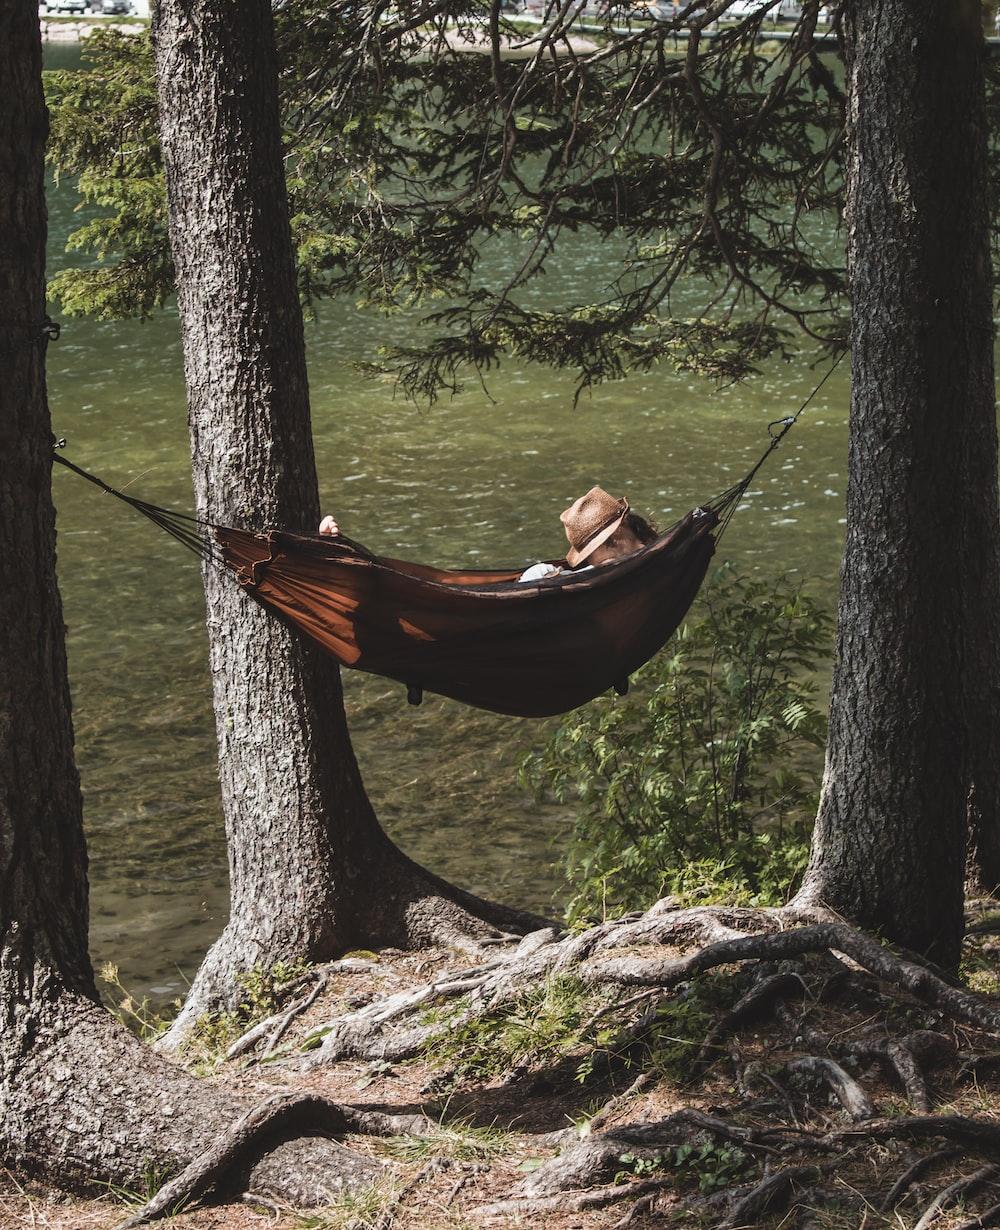 person on brown hammock under tree